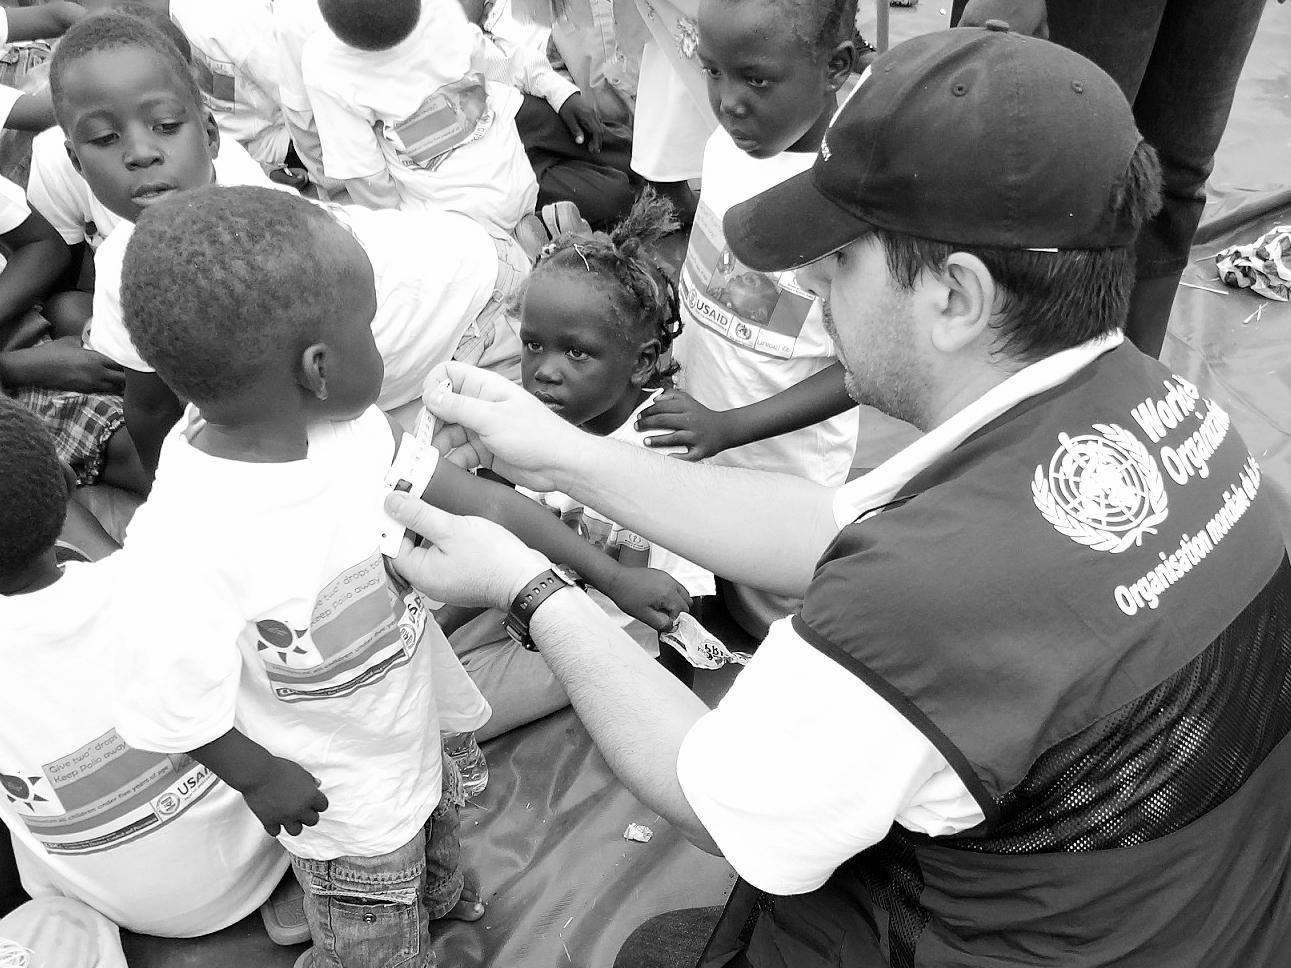 Juba, South Sudan - Amirkambiz Hamedanizadeh, WHO Public Health Officer, Standby Partner Norwegian Refugee Council